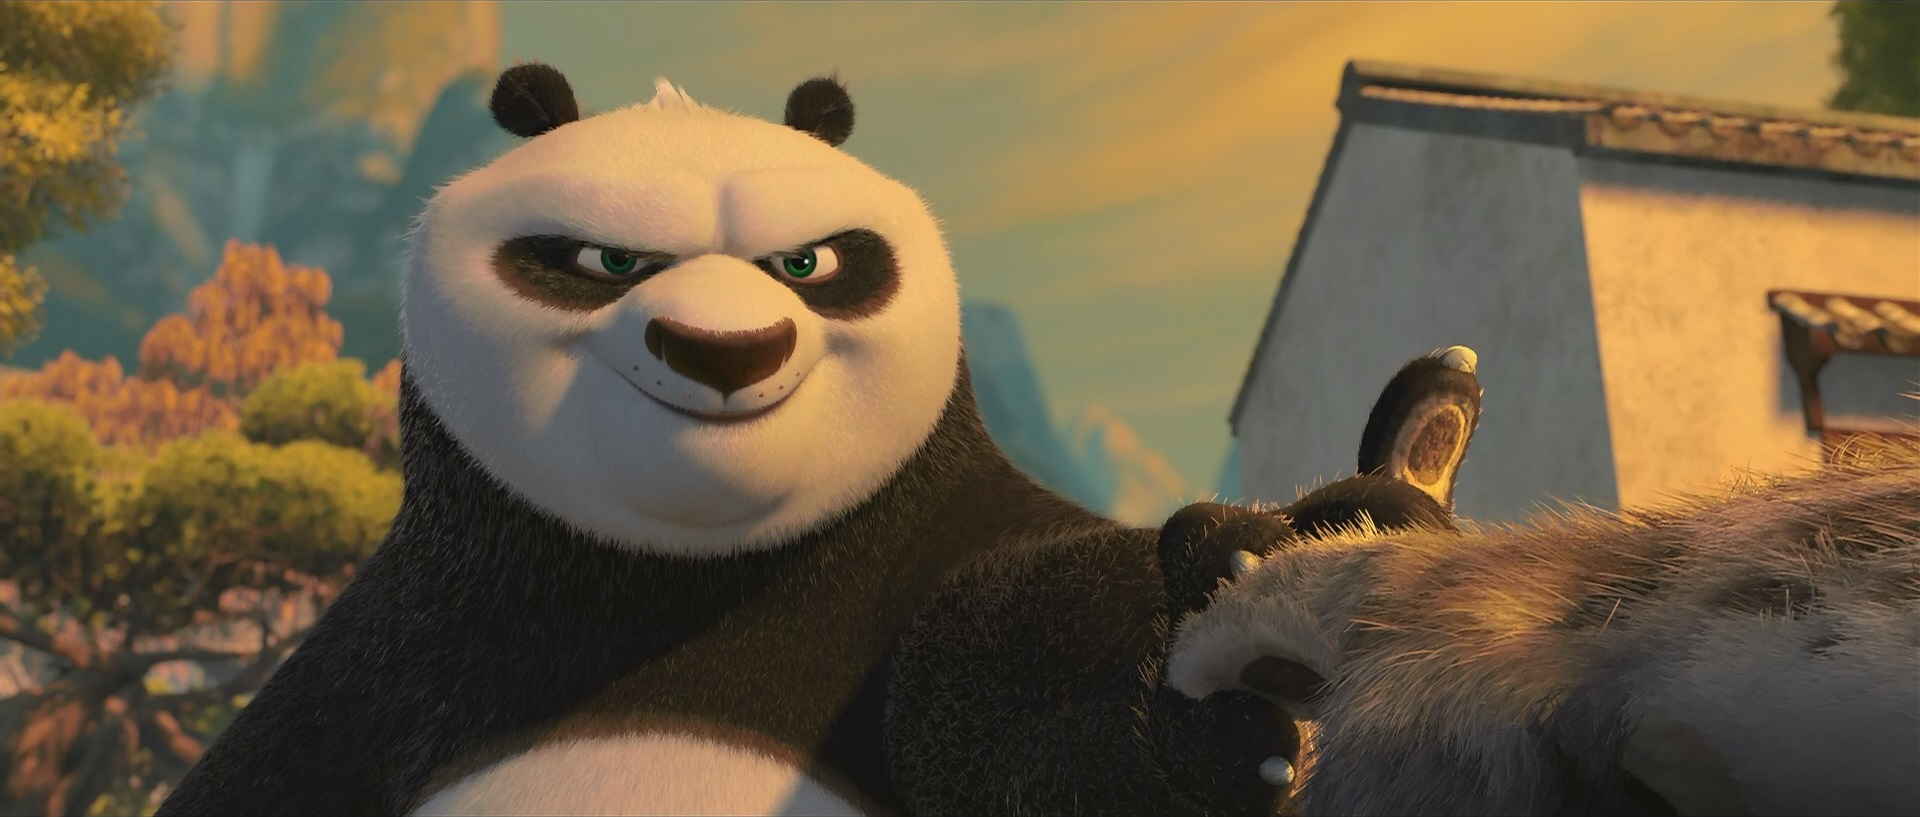 http://img4.wikia.nocookie.net/__cb20140121231948/kung-fu-panda/ru/images/6/62/Po10.jpg